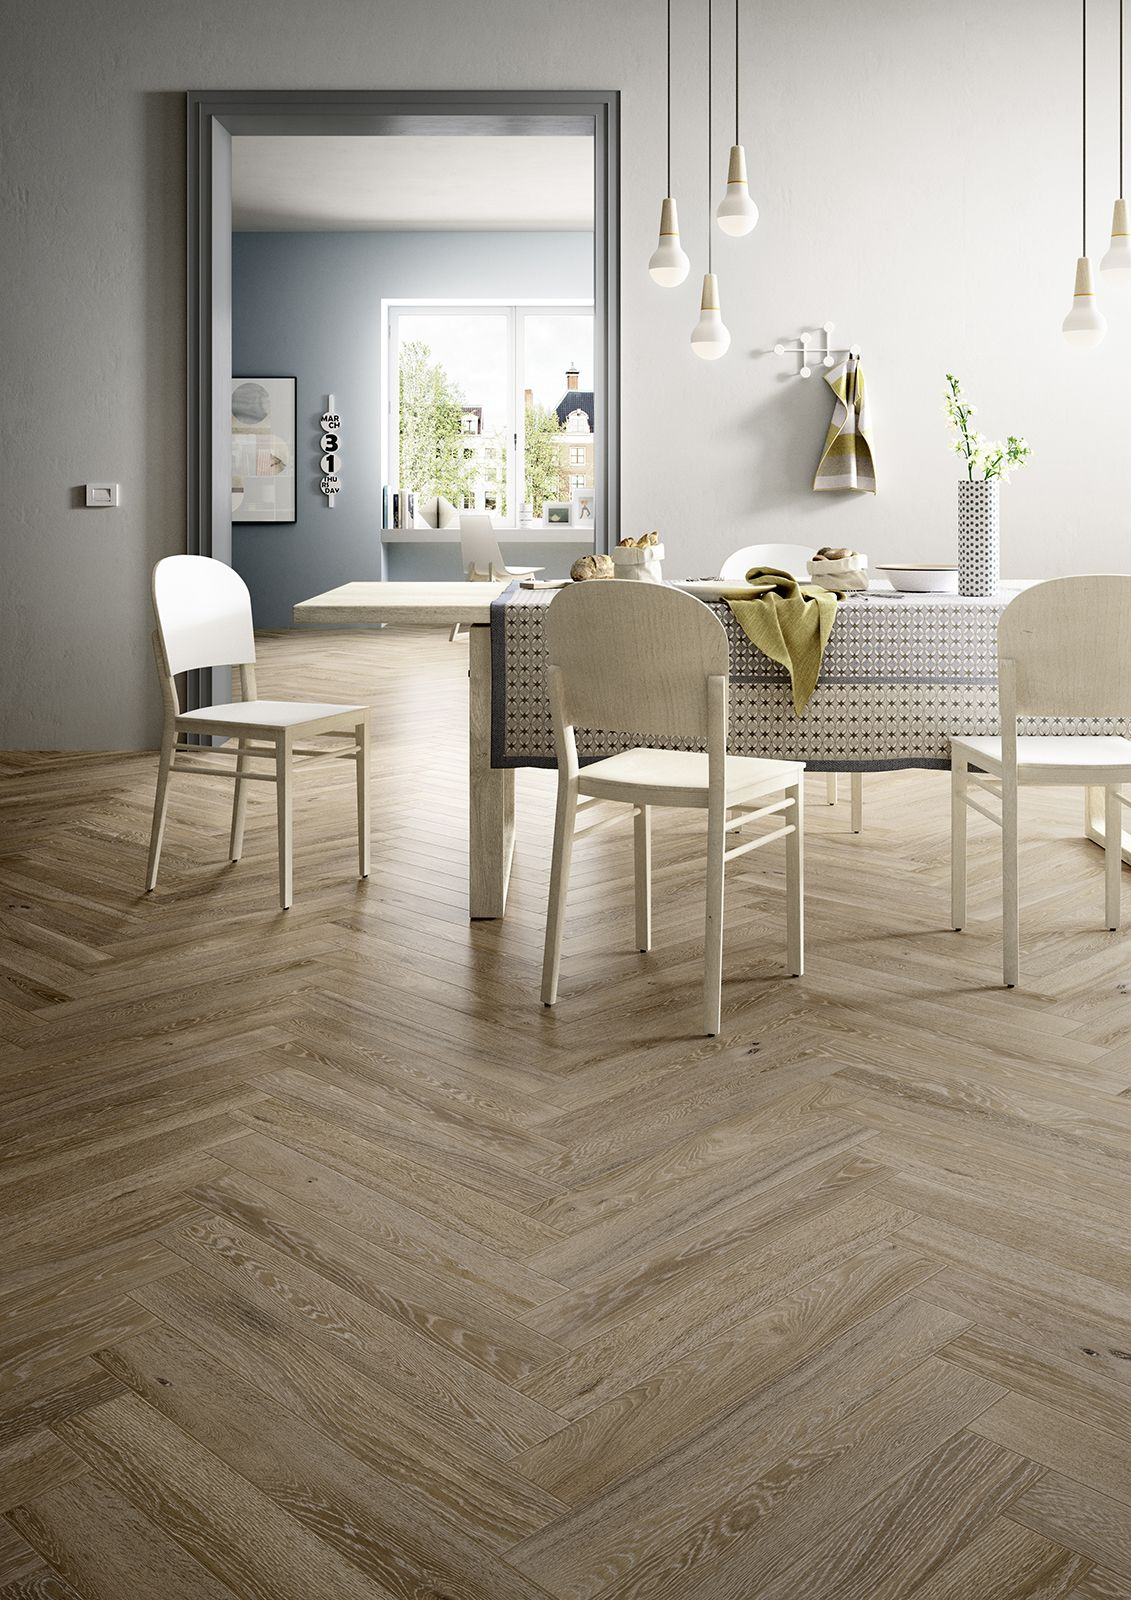 Marazzi Treverkcharme Beige 10x70 Cm Mm92 Porcelain Stoneware Wood 10x70 On Bathroom39 Com Wood Effect Floor Tiles Faux Wood Tiles Living Room Tiles